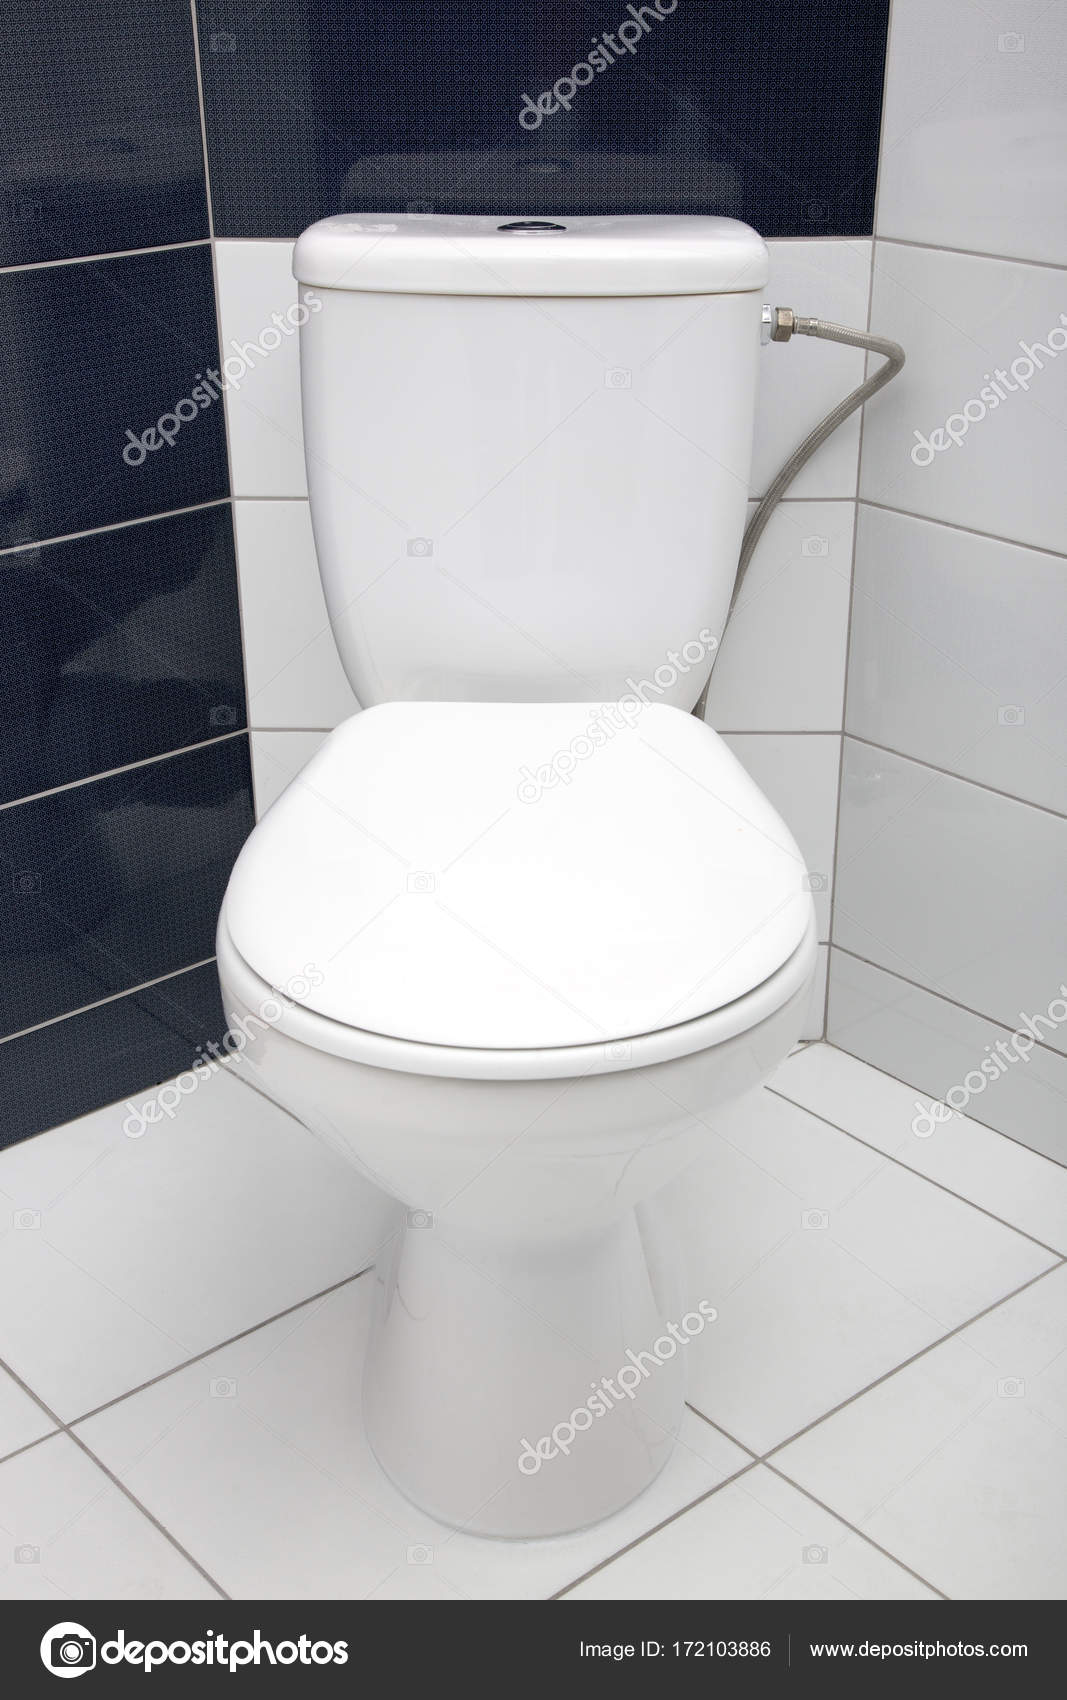 Бачок для ванной комнаты посейдон ремонт ванной комнаты